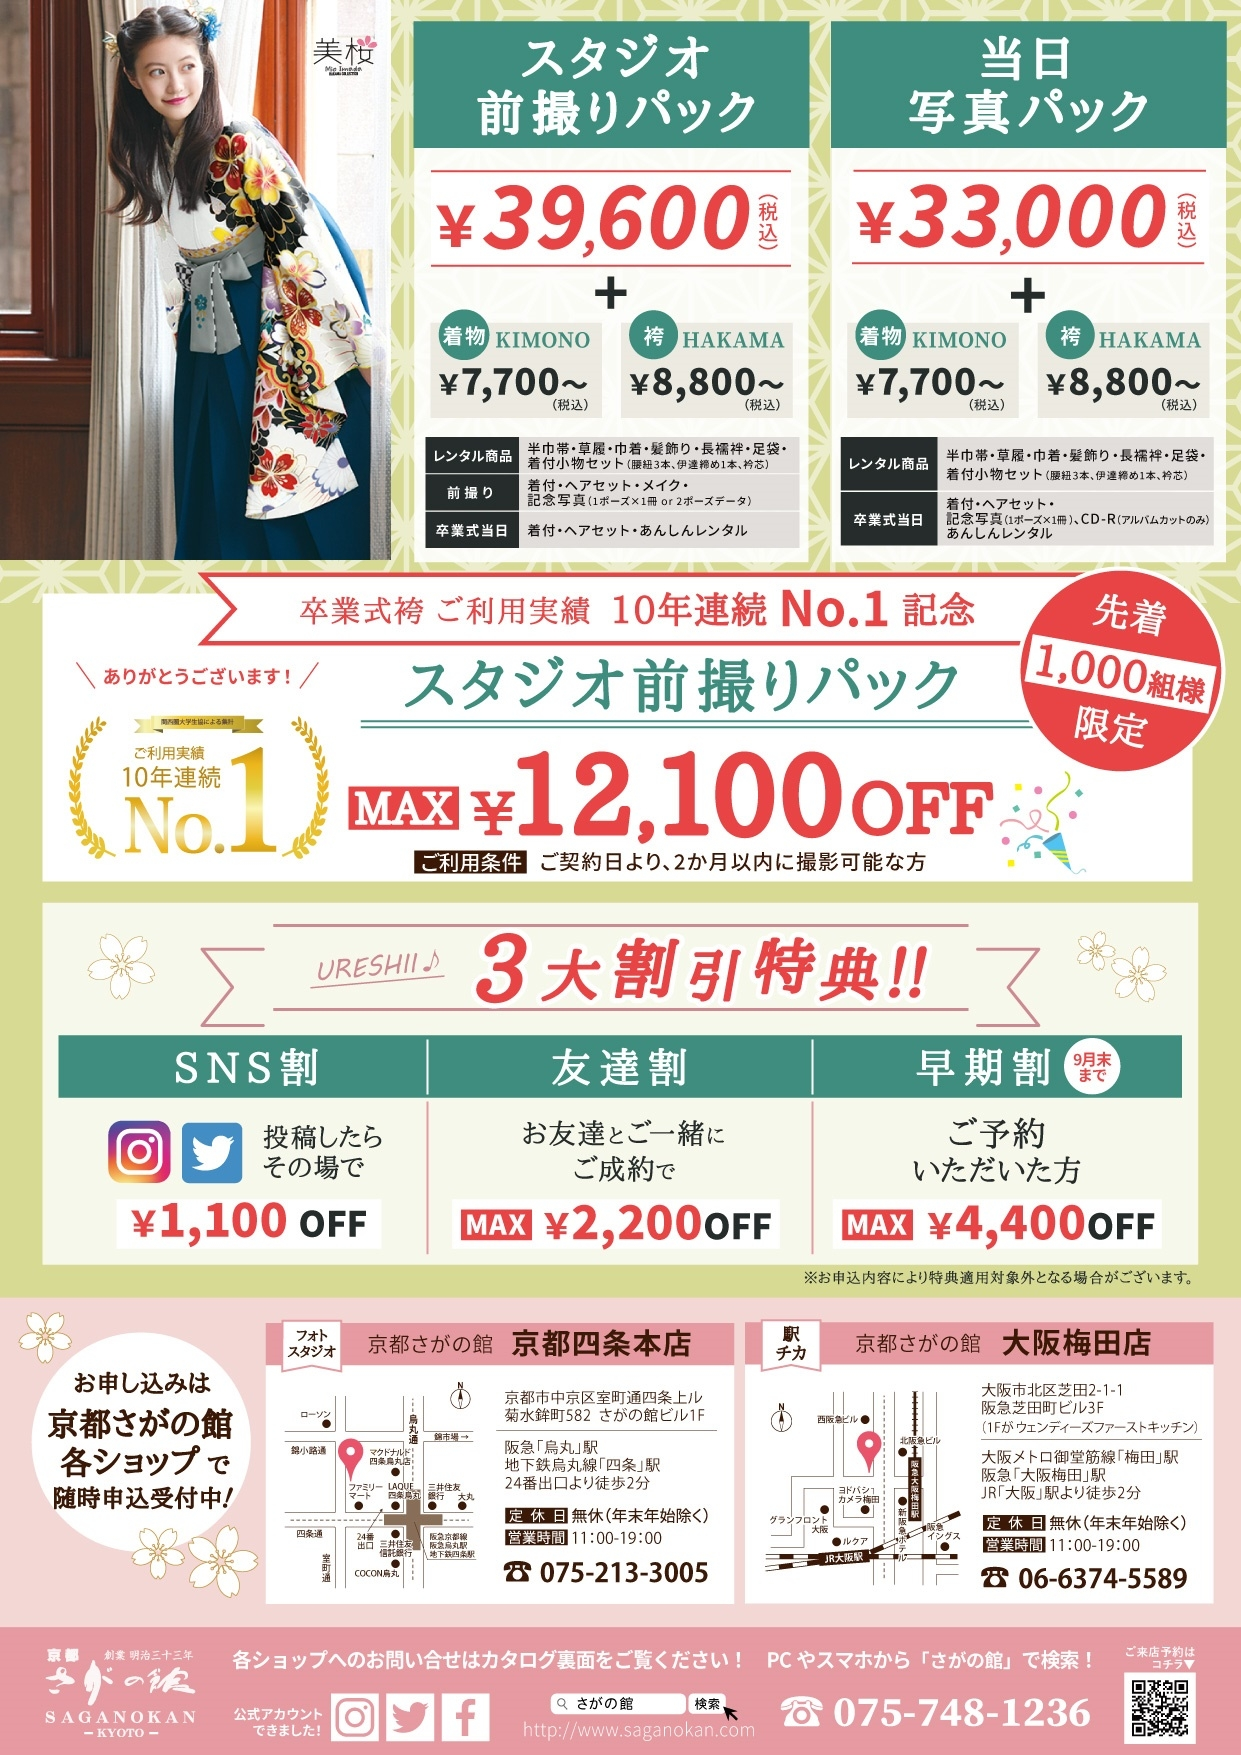 hakama202108-2.jpg